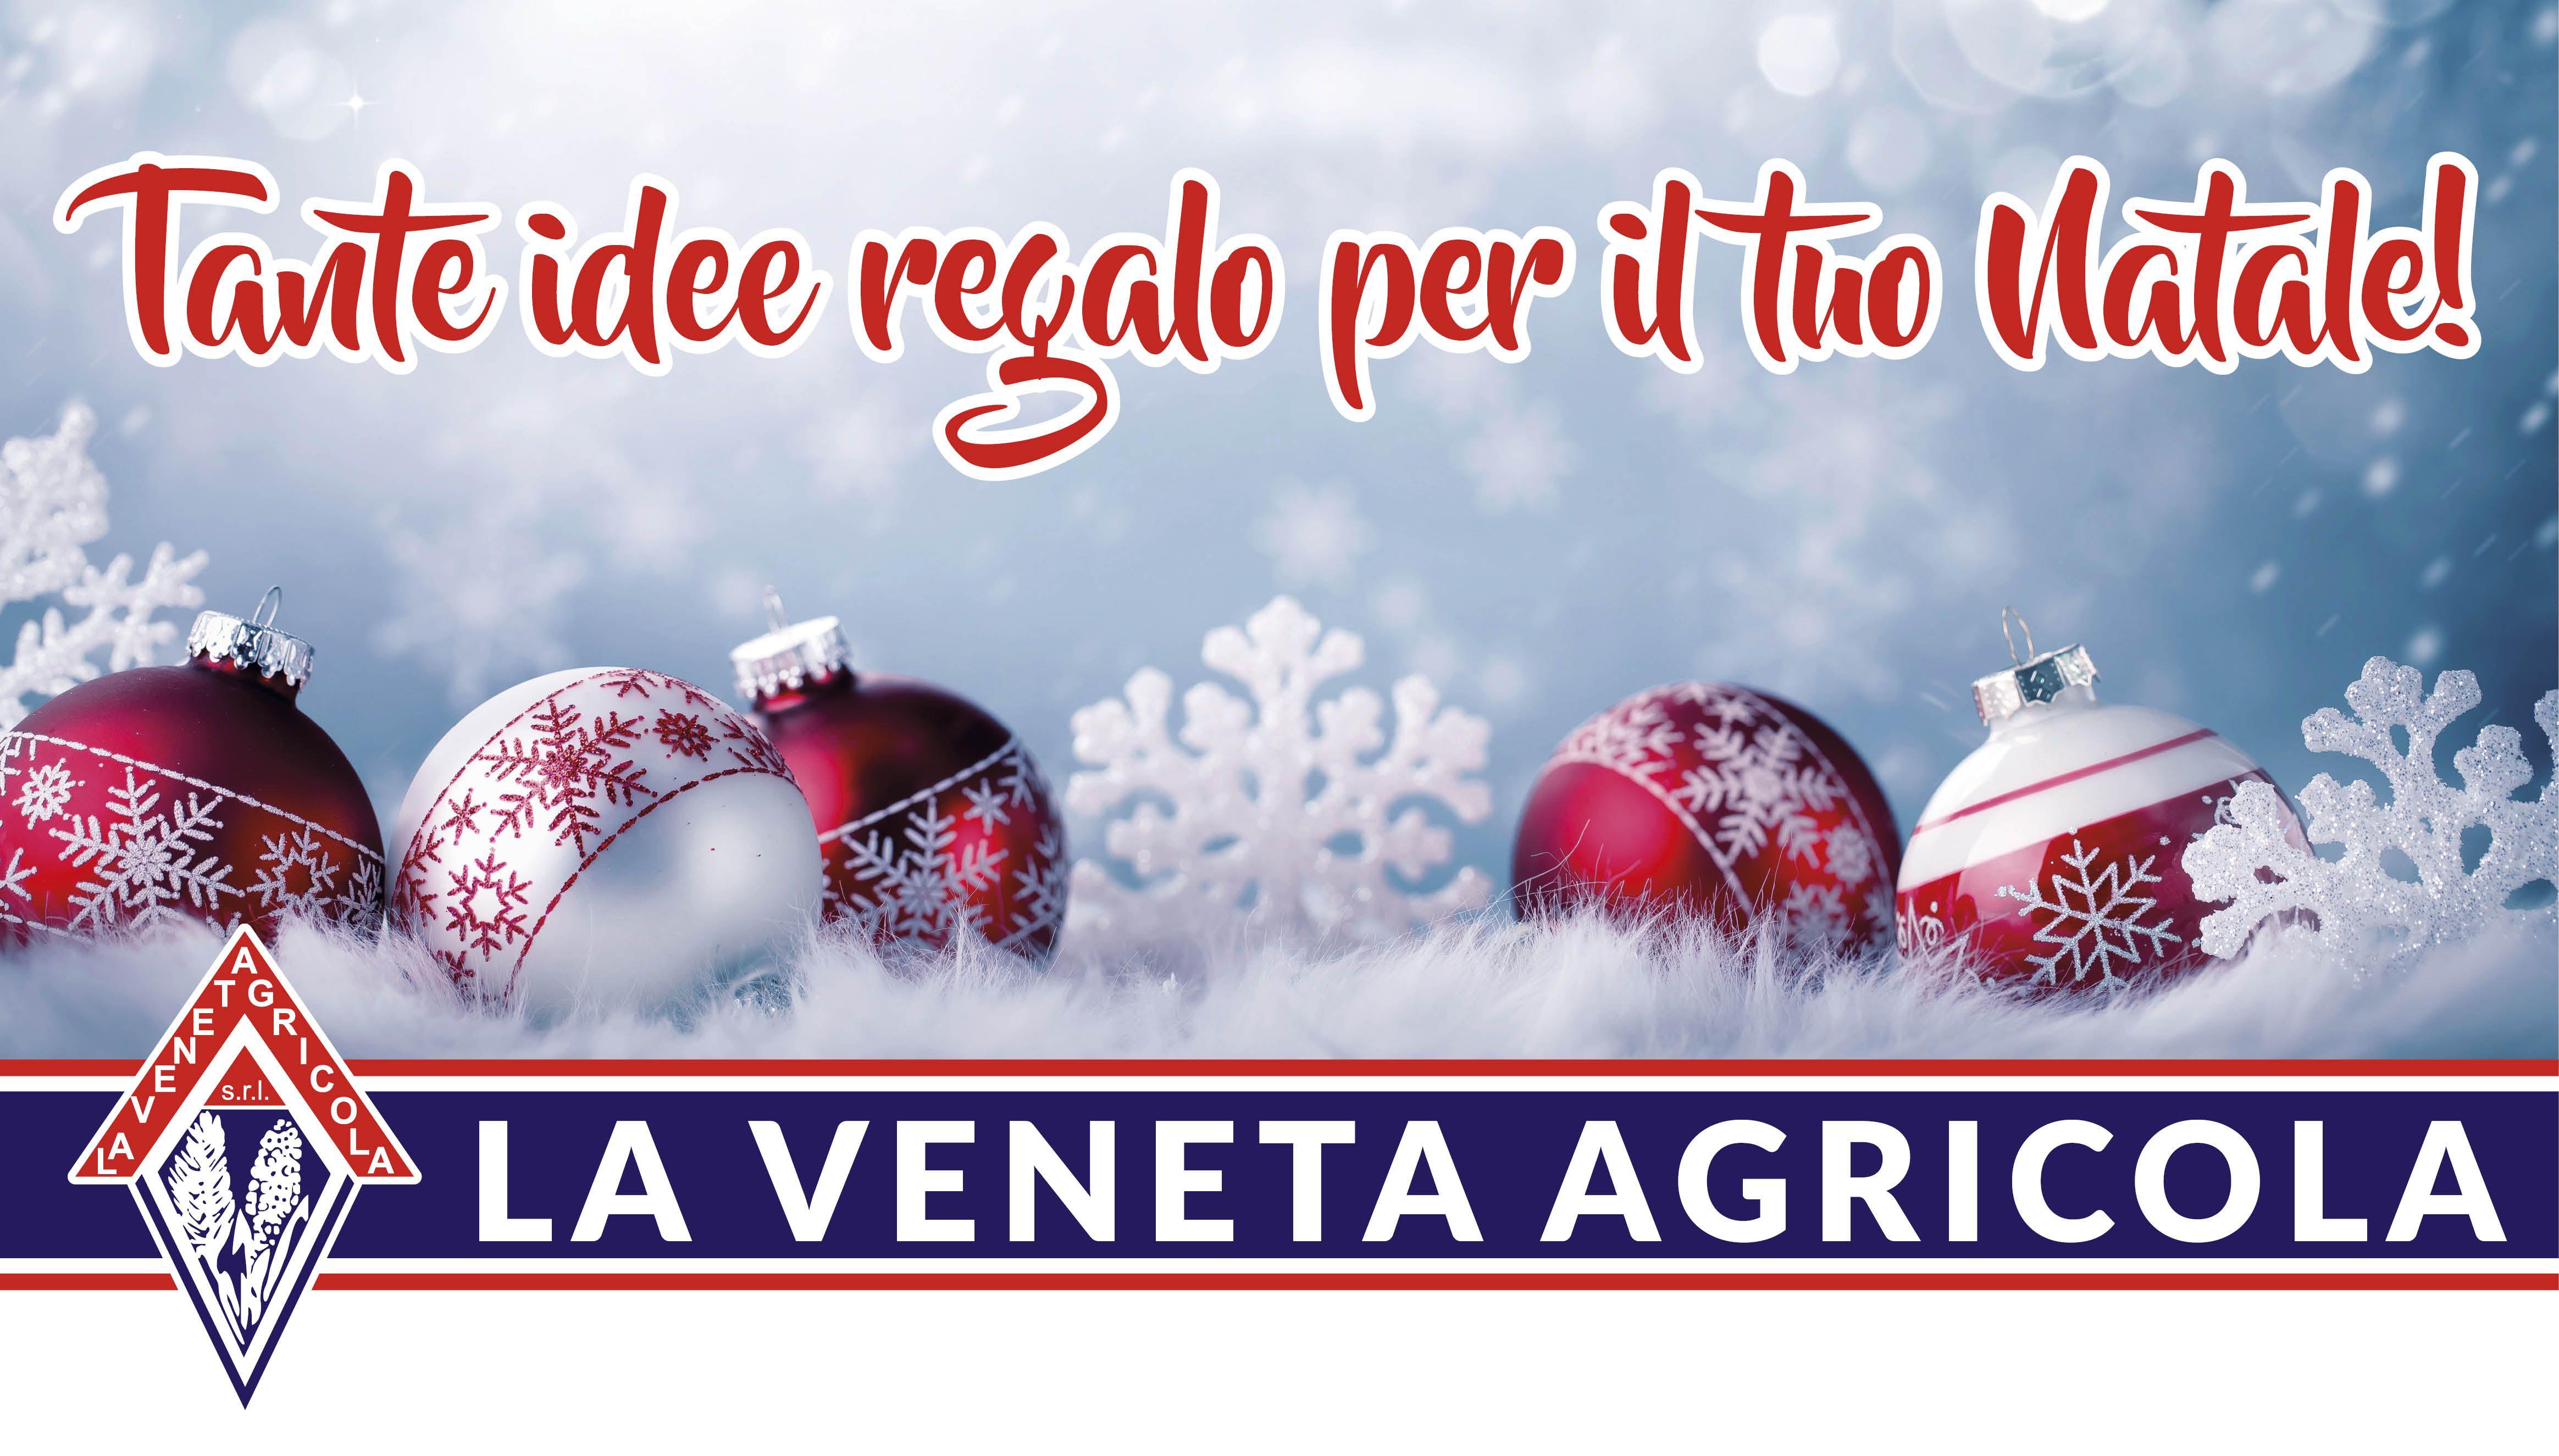 bed402d4b3 Tante idee regalo per Natale! - La Veneta Agricola